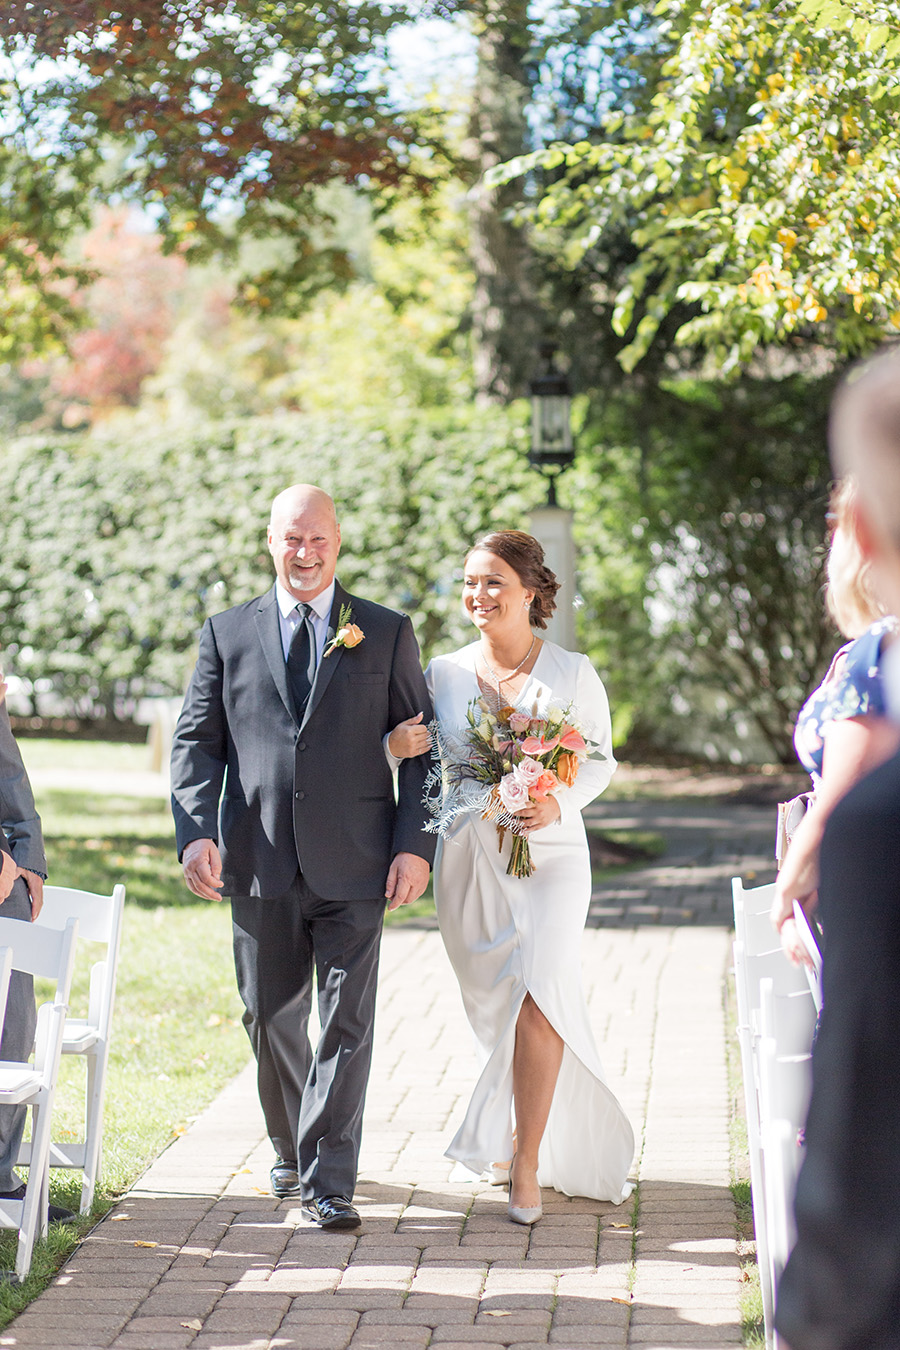 Outdoor wedding ceremony at Olde Mill Inn